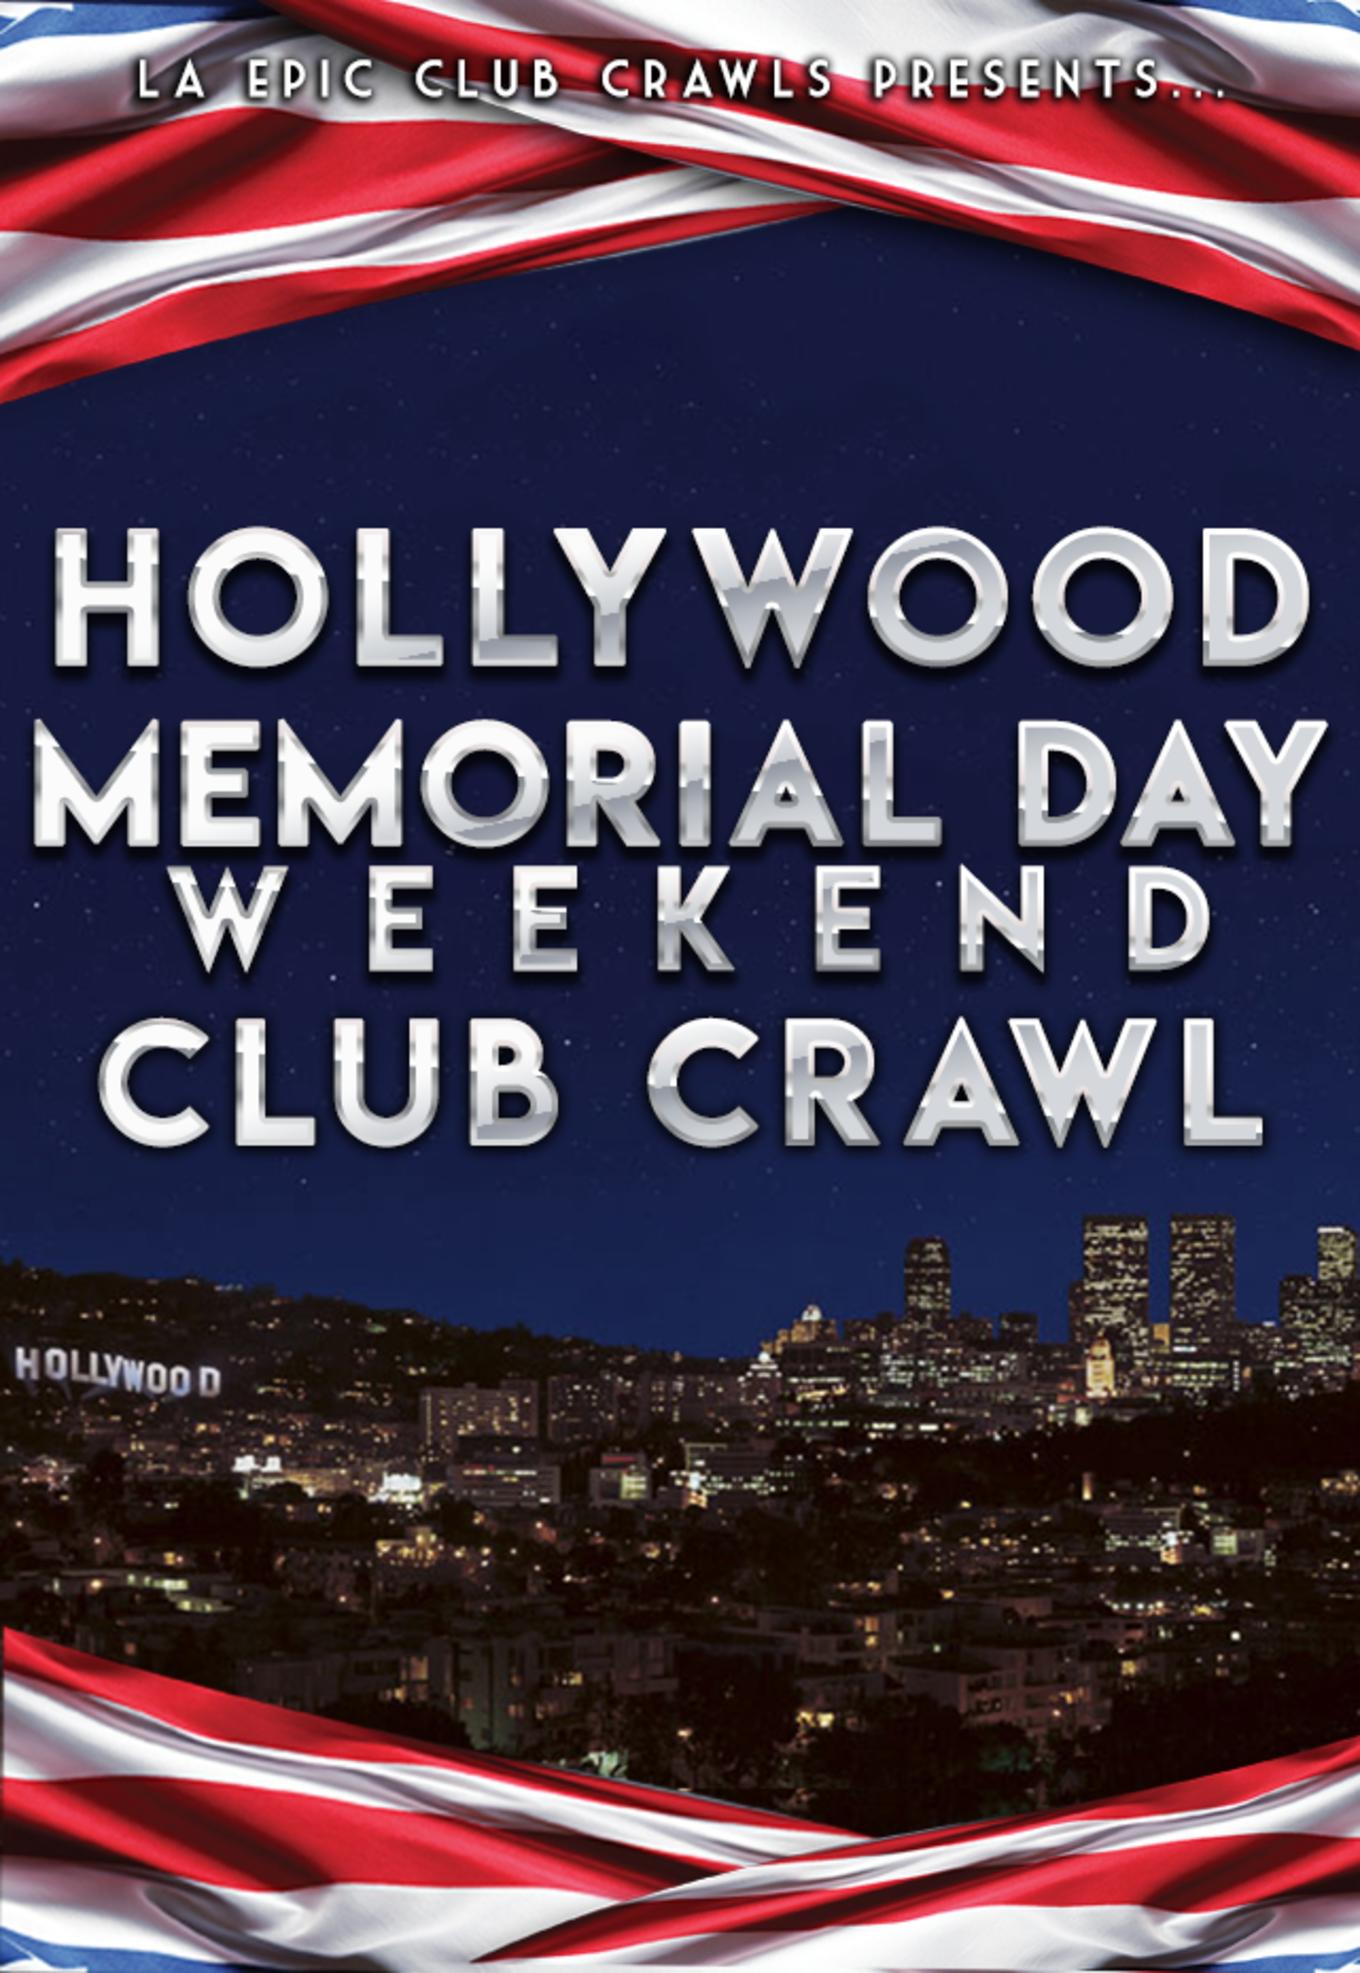 2019 Memorial Day Weekend Hollywood Club Crawl - Tickets